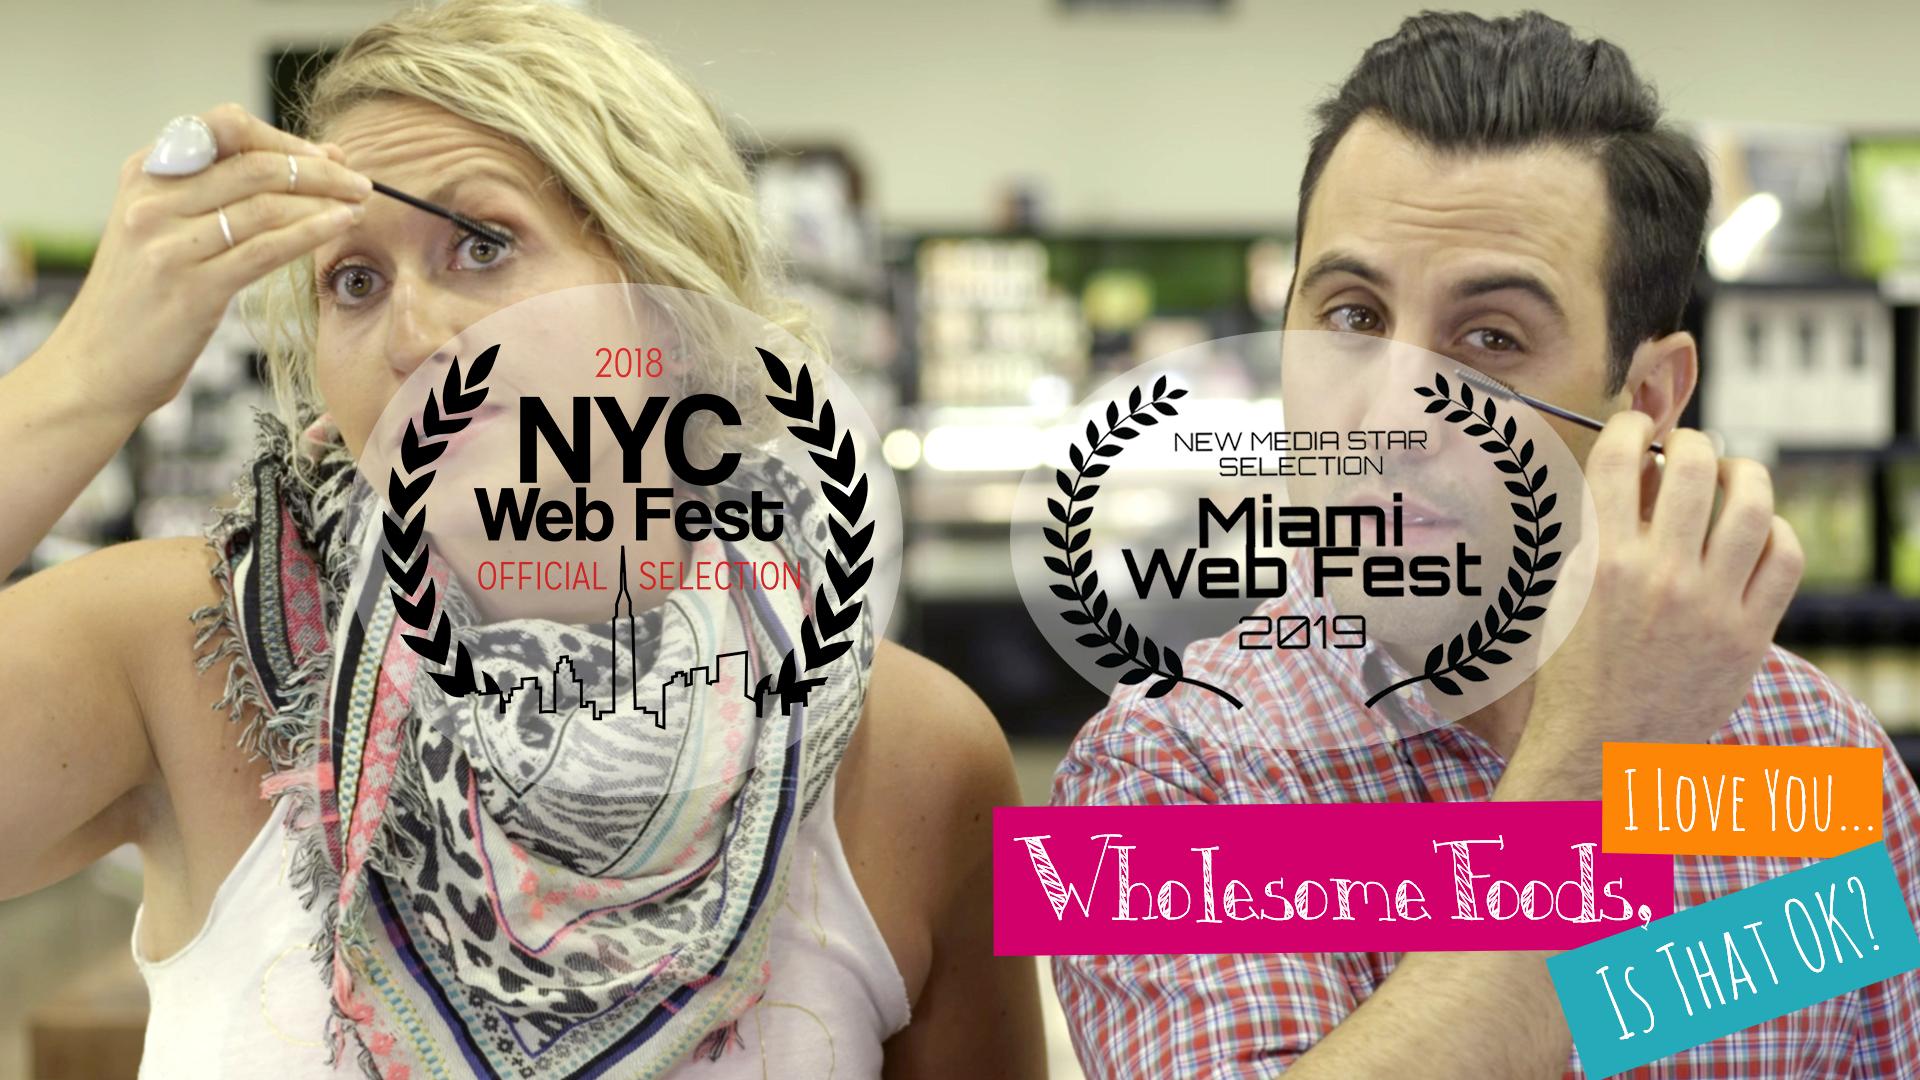 WFILY-16-9-Trailer-MiamiNYC.jpg